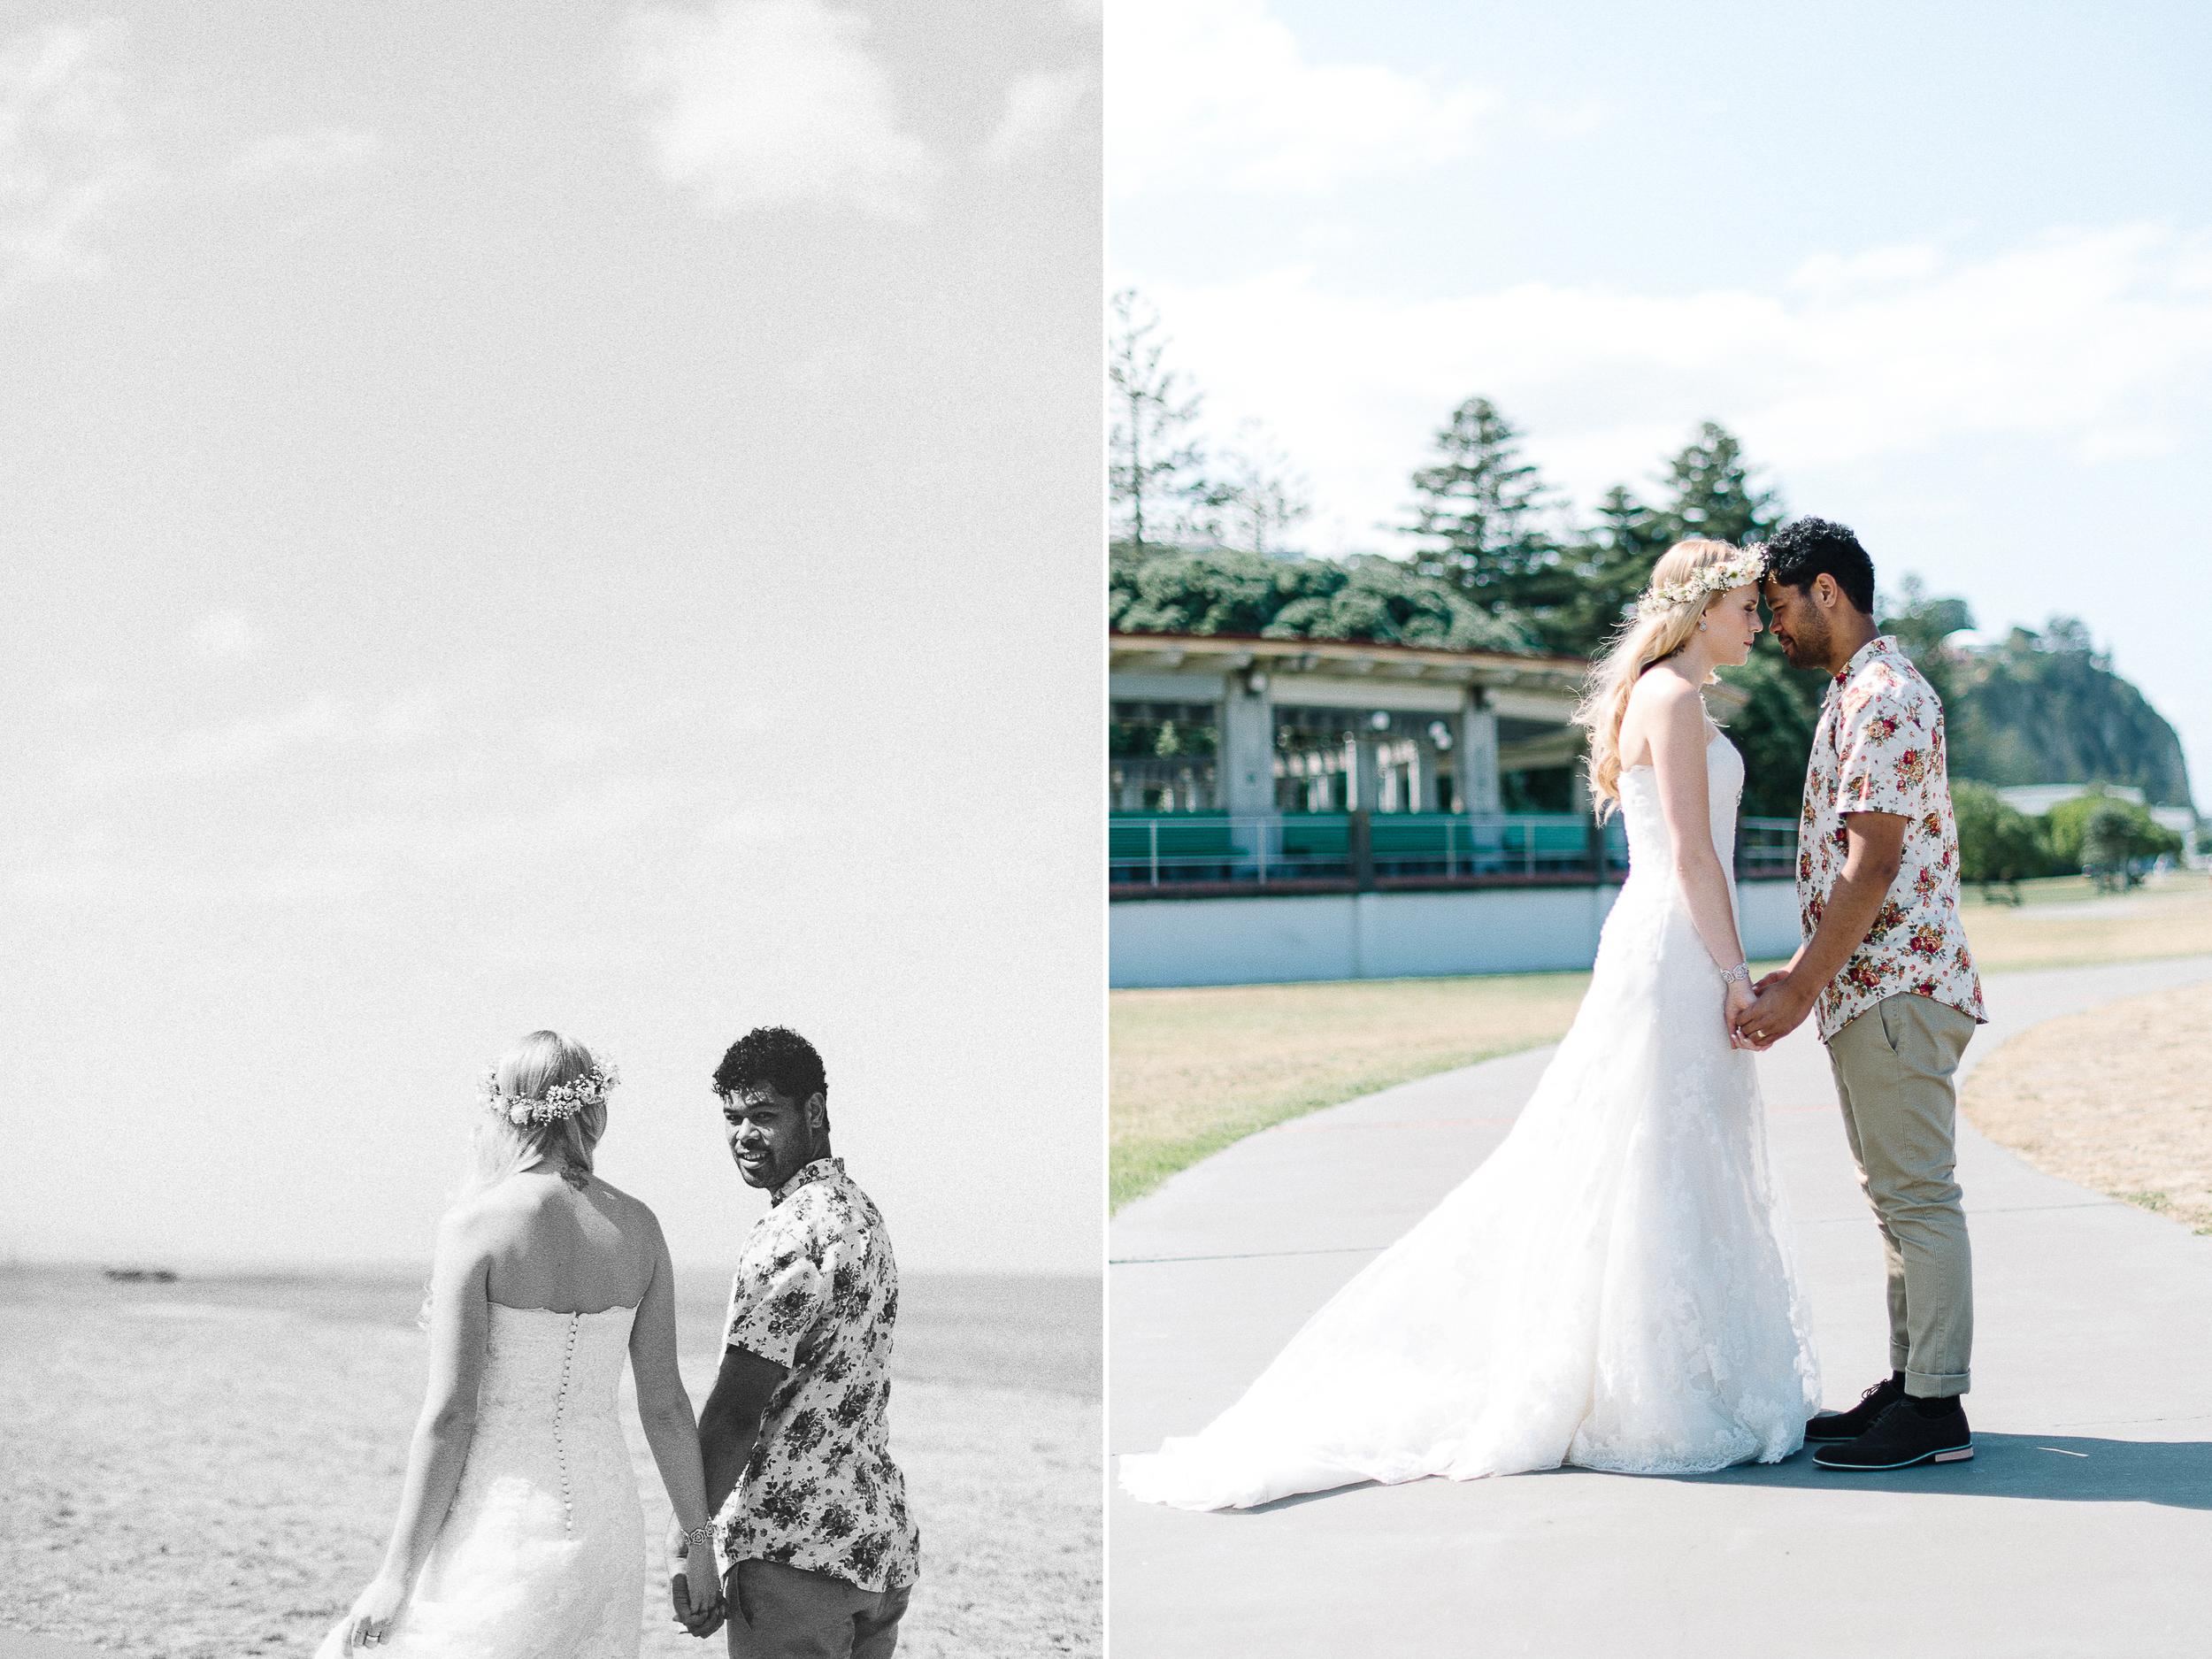 New-Zealand-Wedding-Photographer-51.jpg